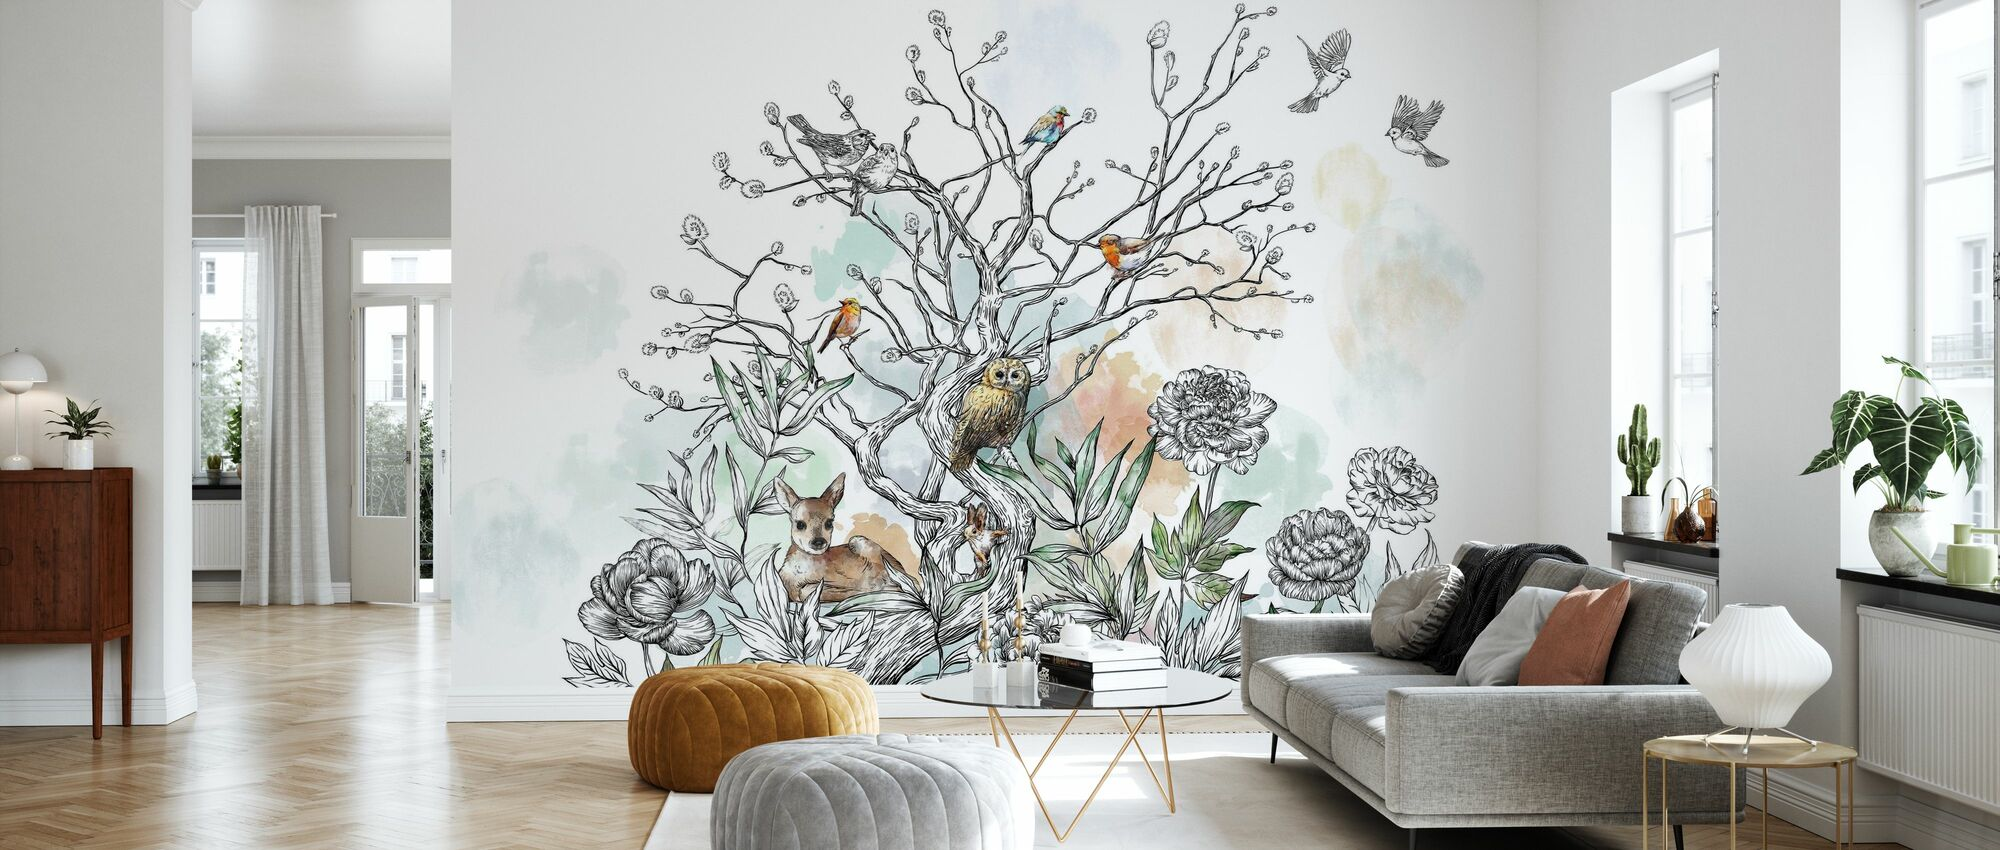 Animal Treet - Tapet - Stue